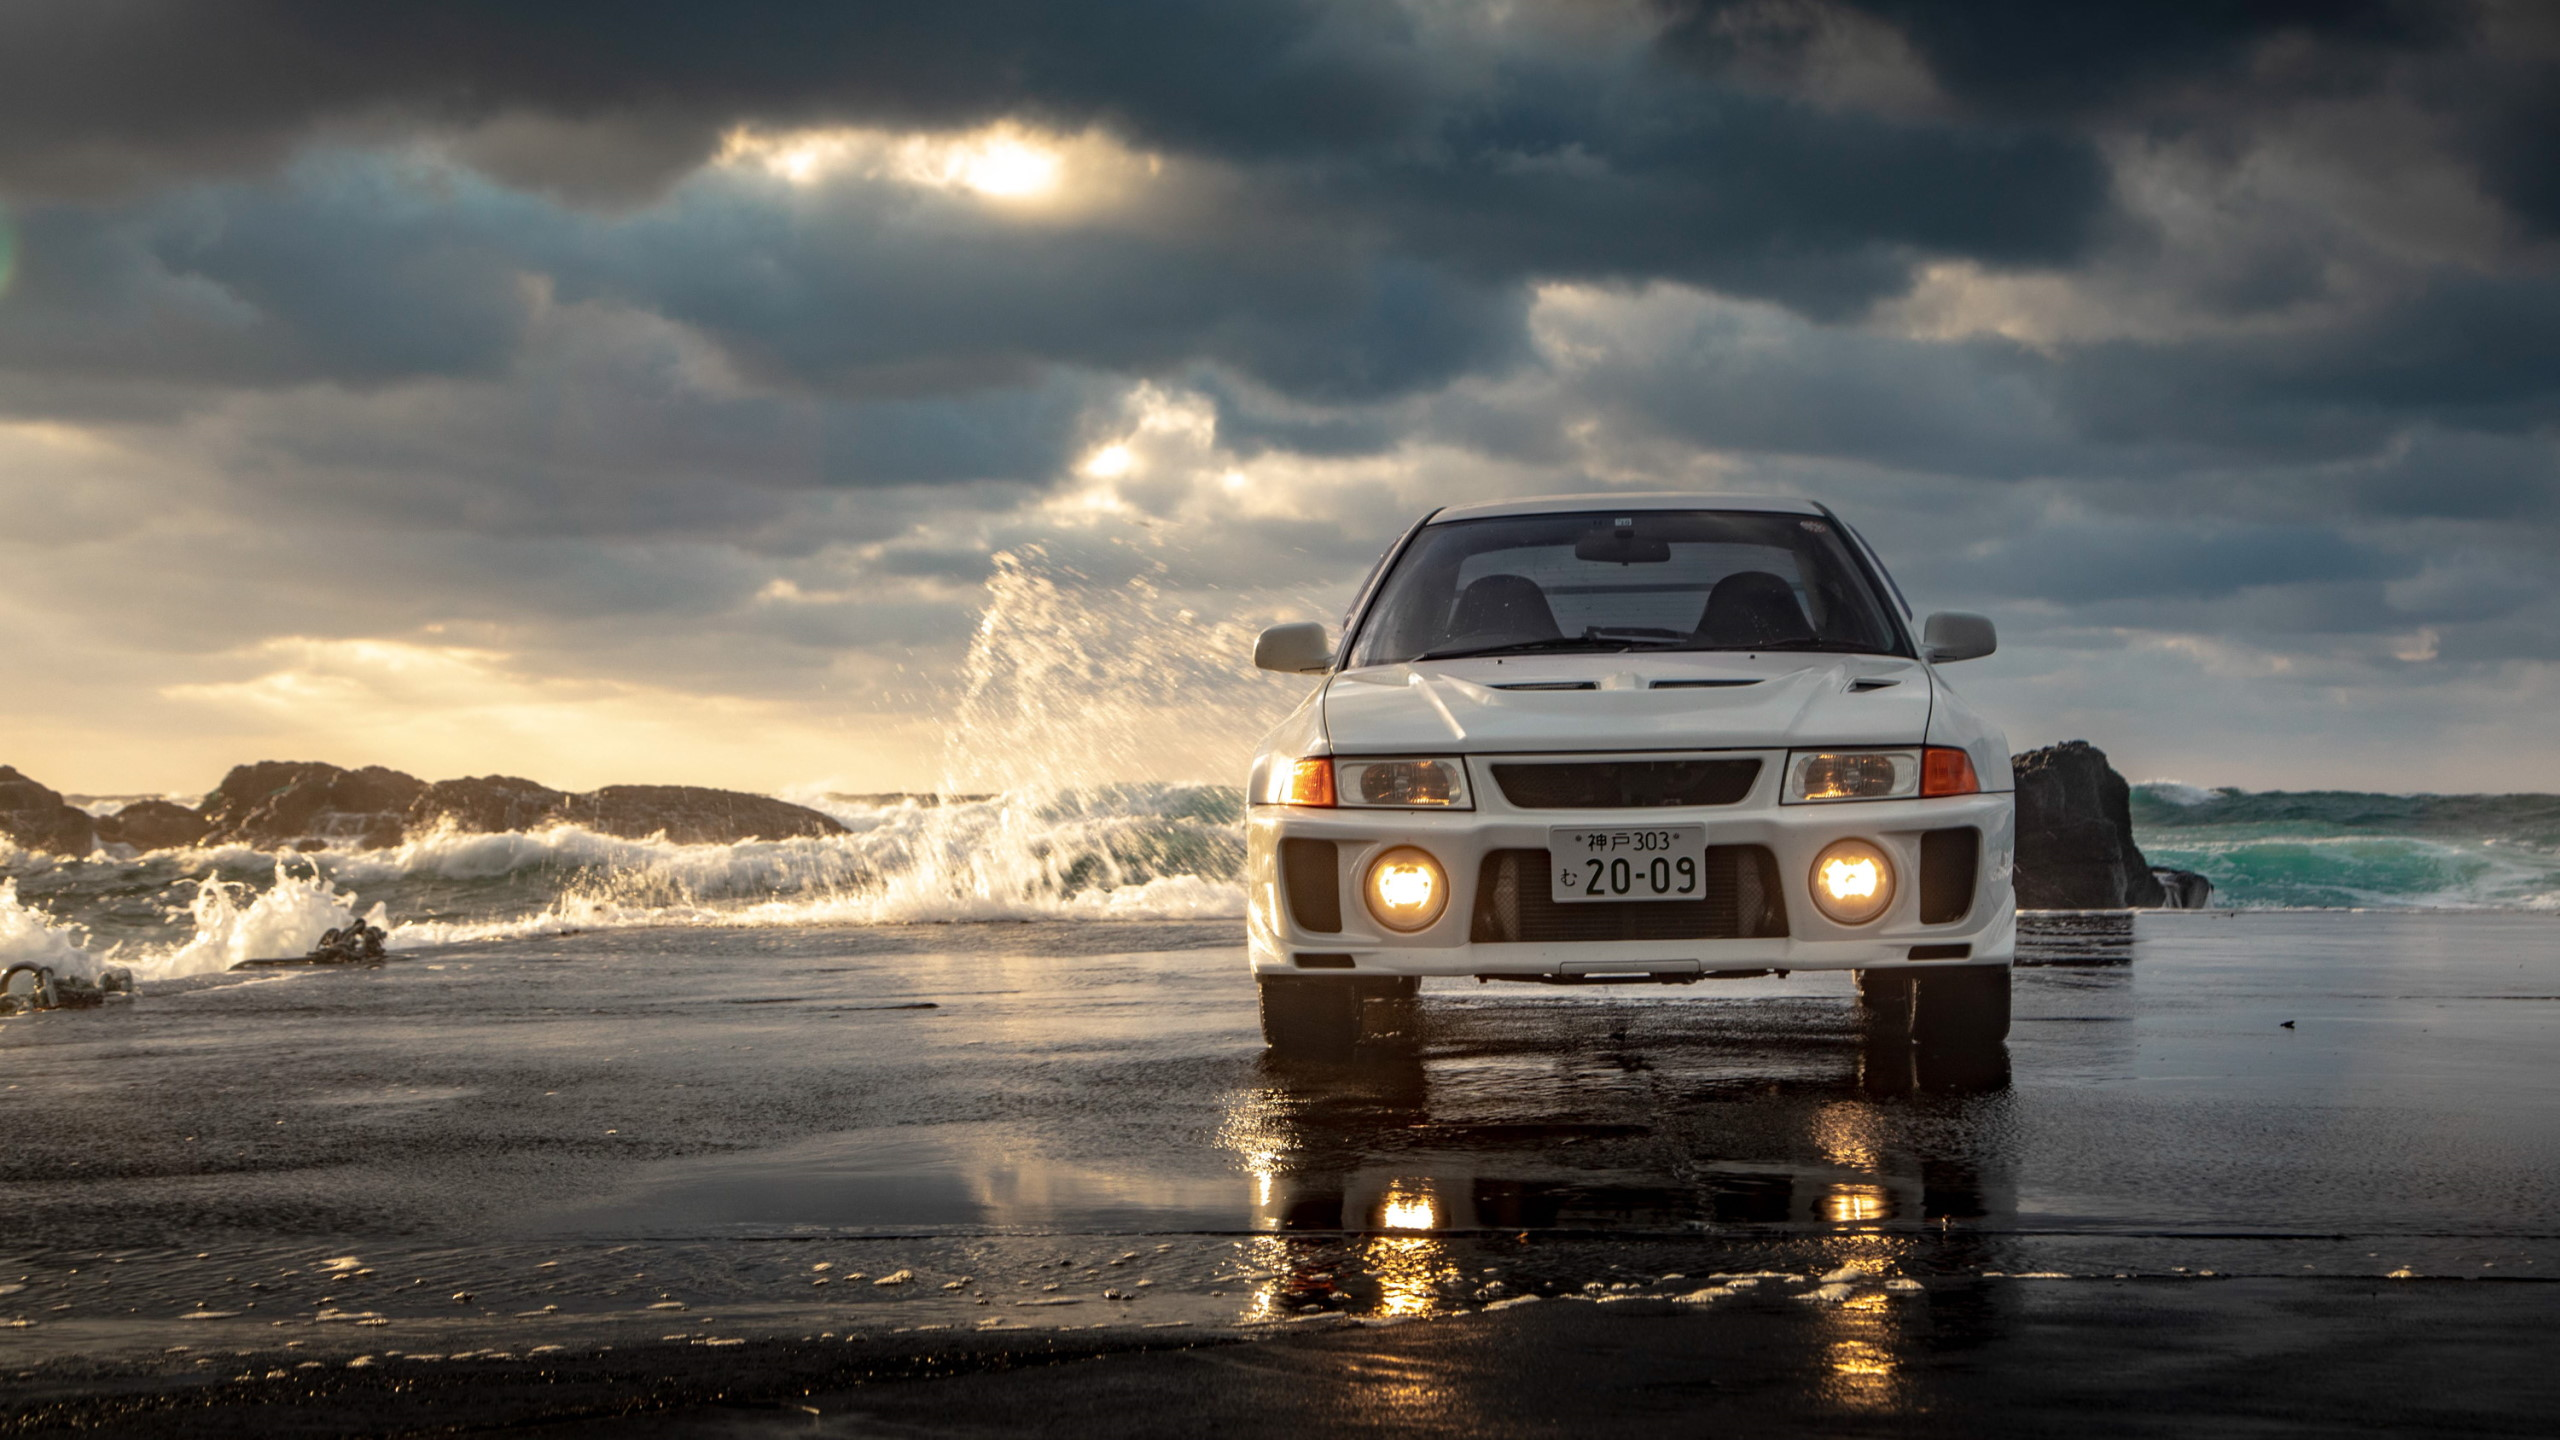 General 2560x1440 beach waves Mitsubishi Lancer Evo V Headlights frontal view white cars JDM Japanese cars